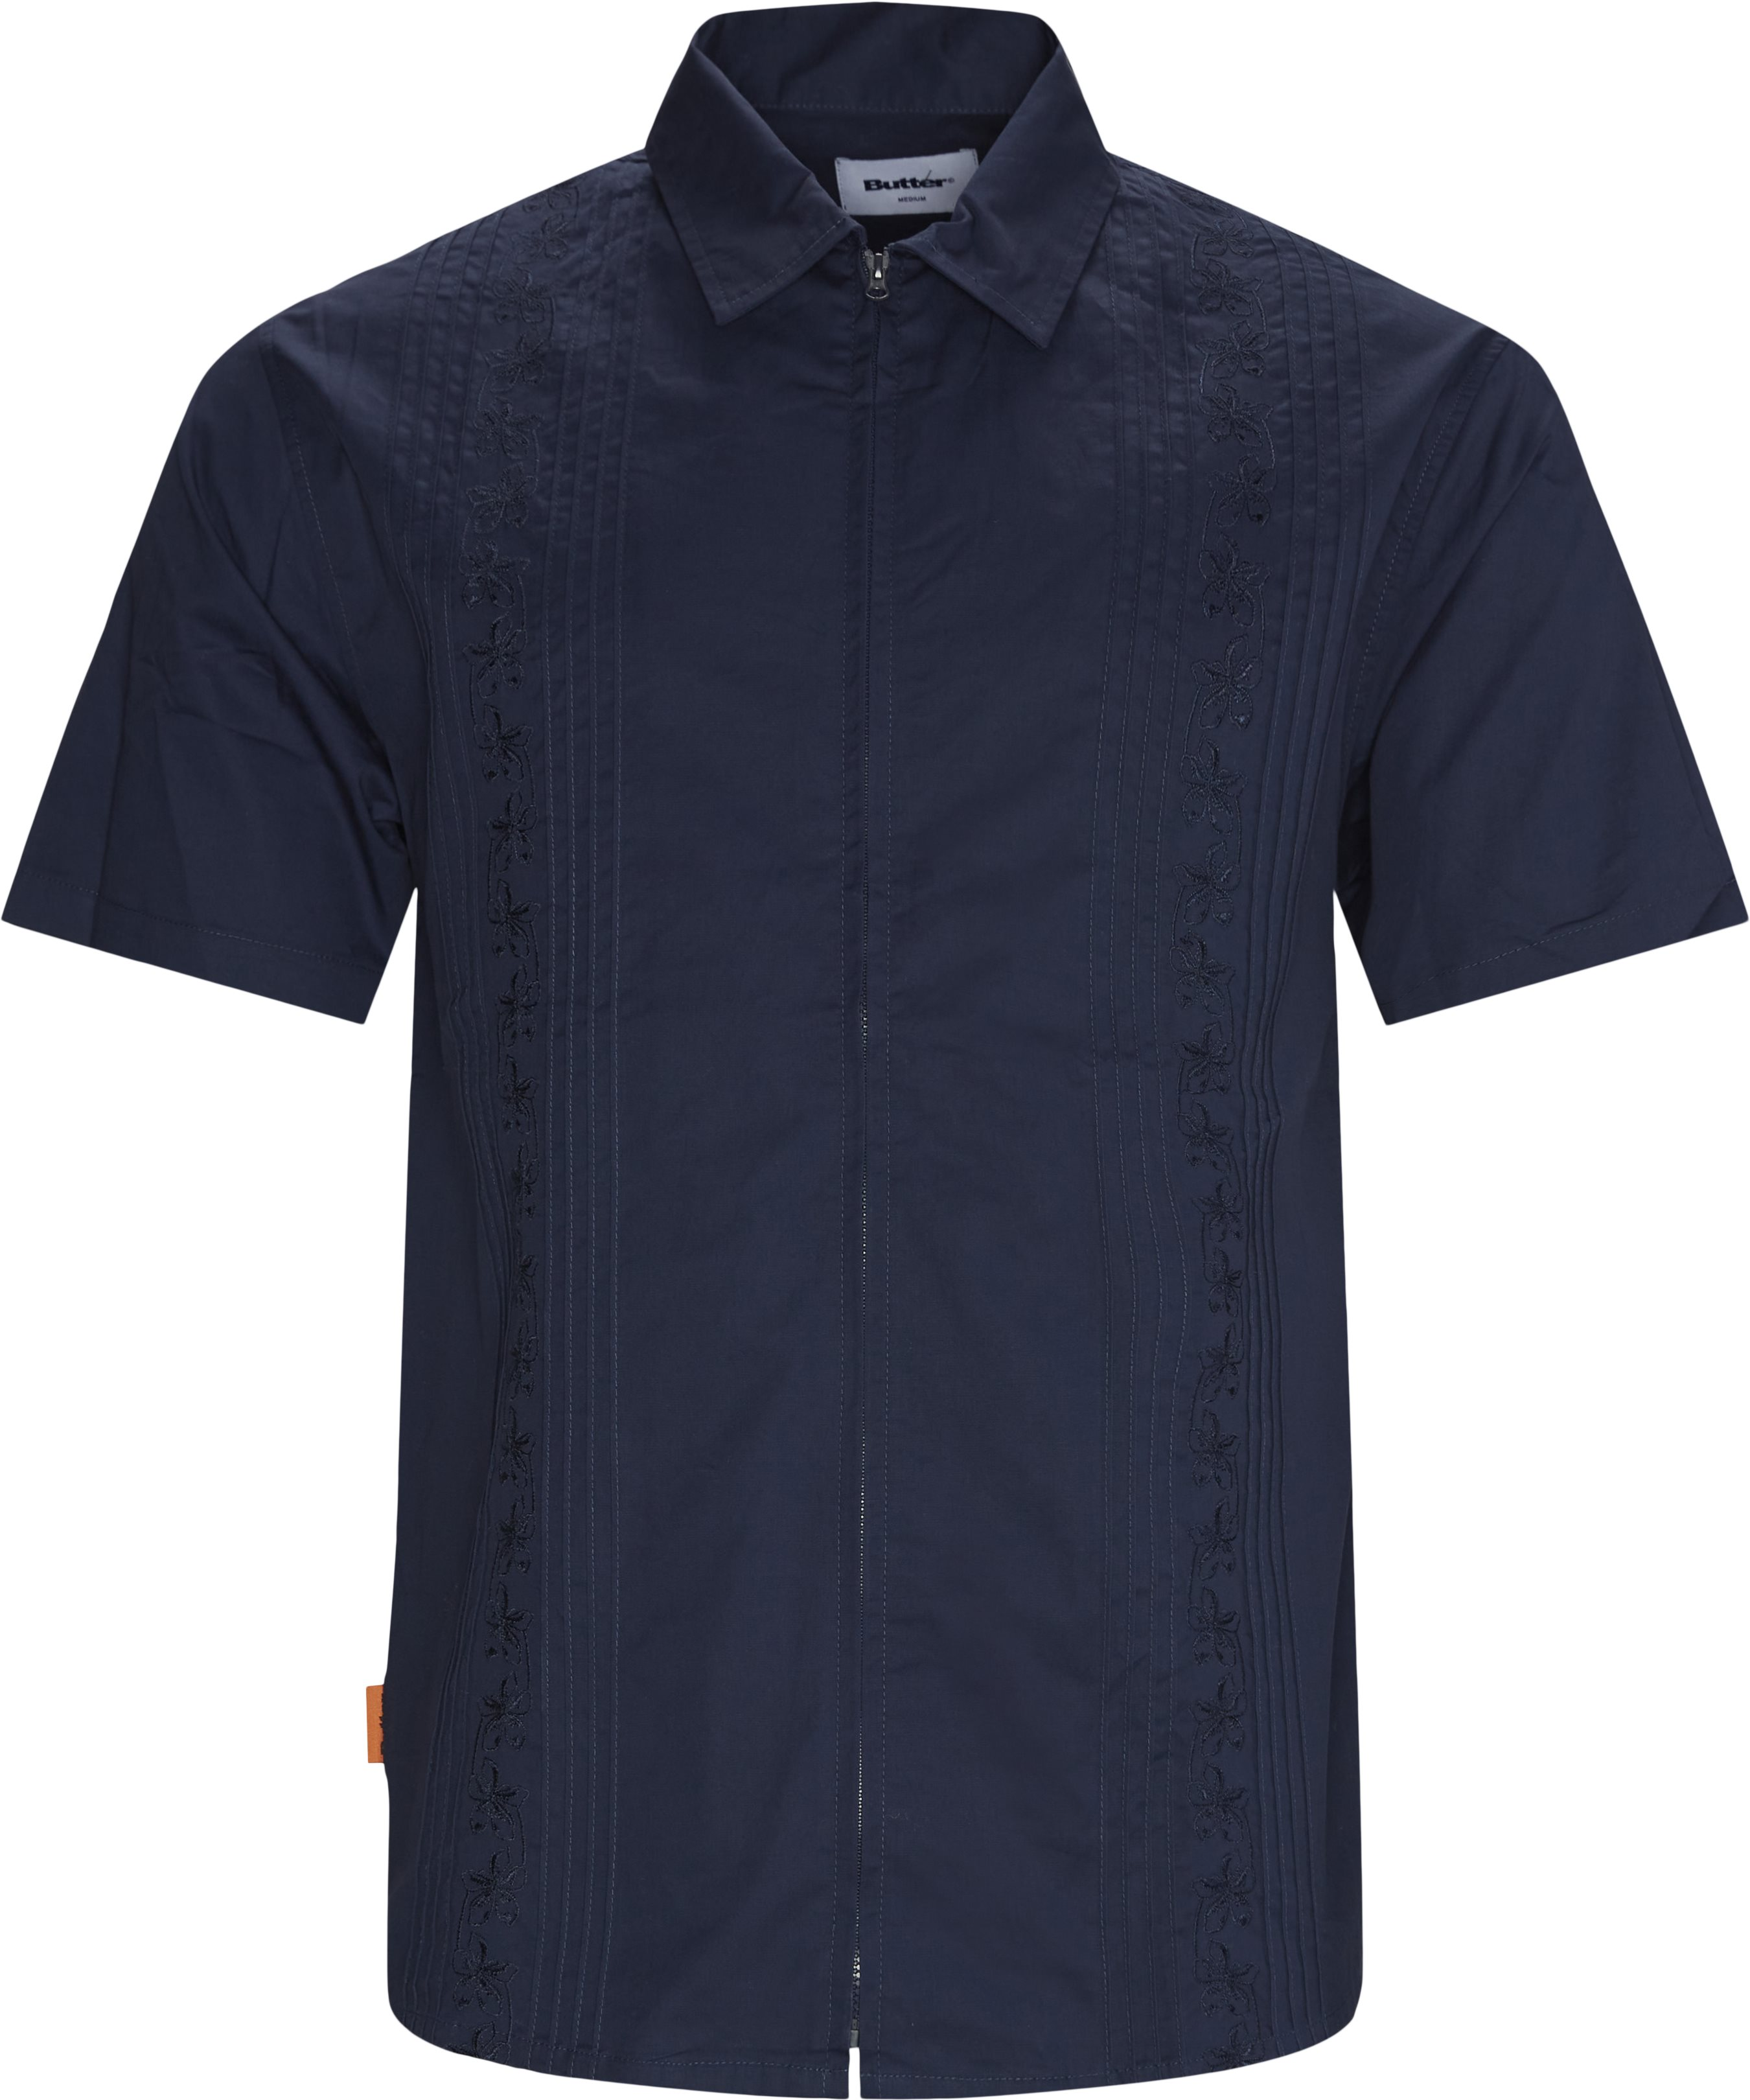 Floral Zip K/Æ Skjorte - Skjorter - Regular - Blå